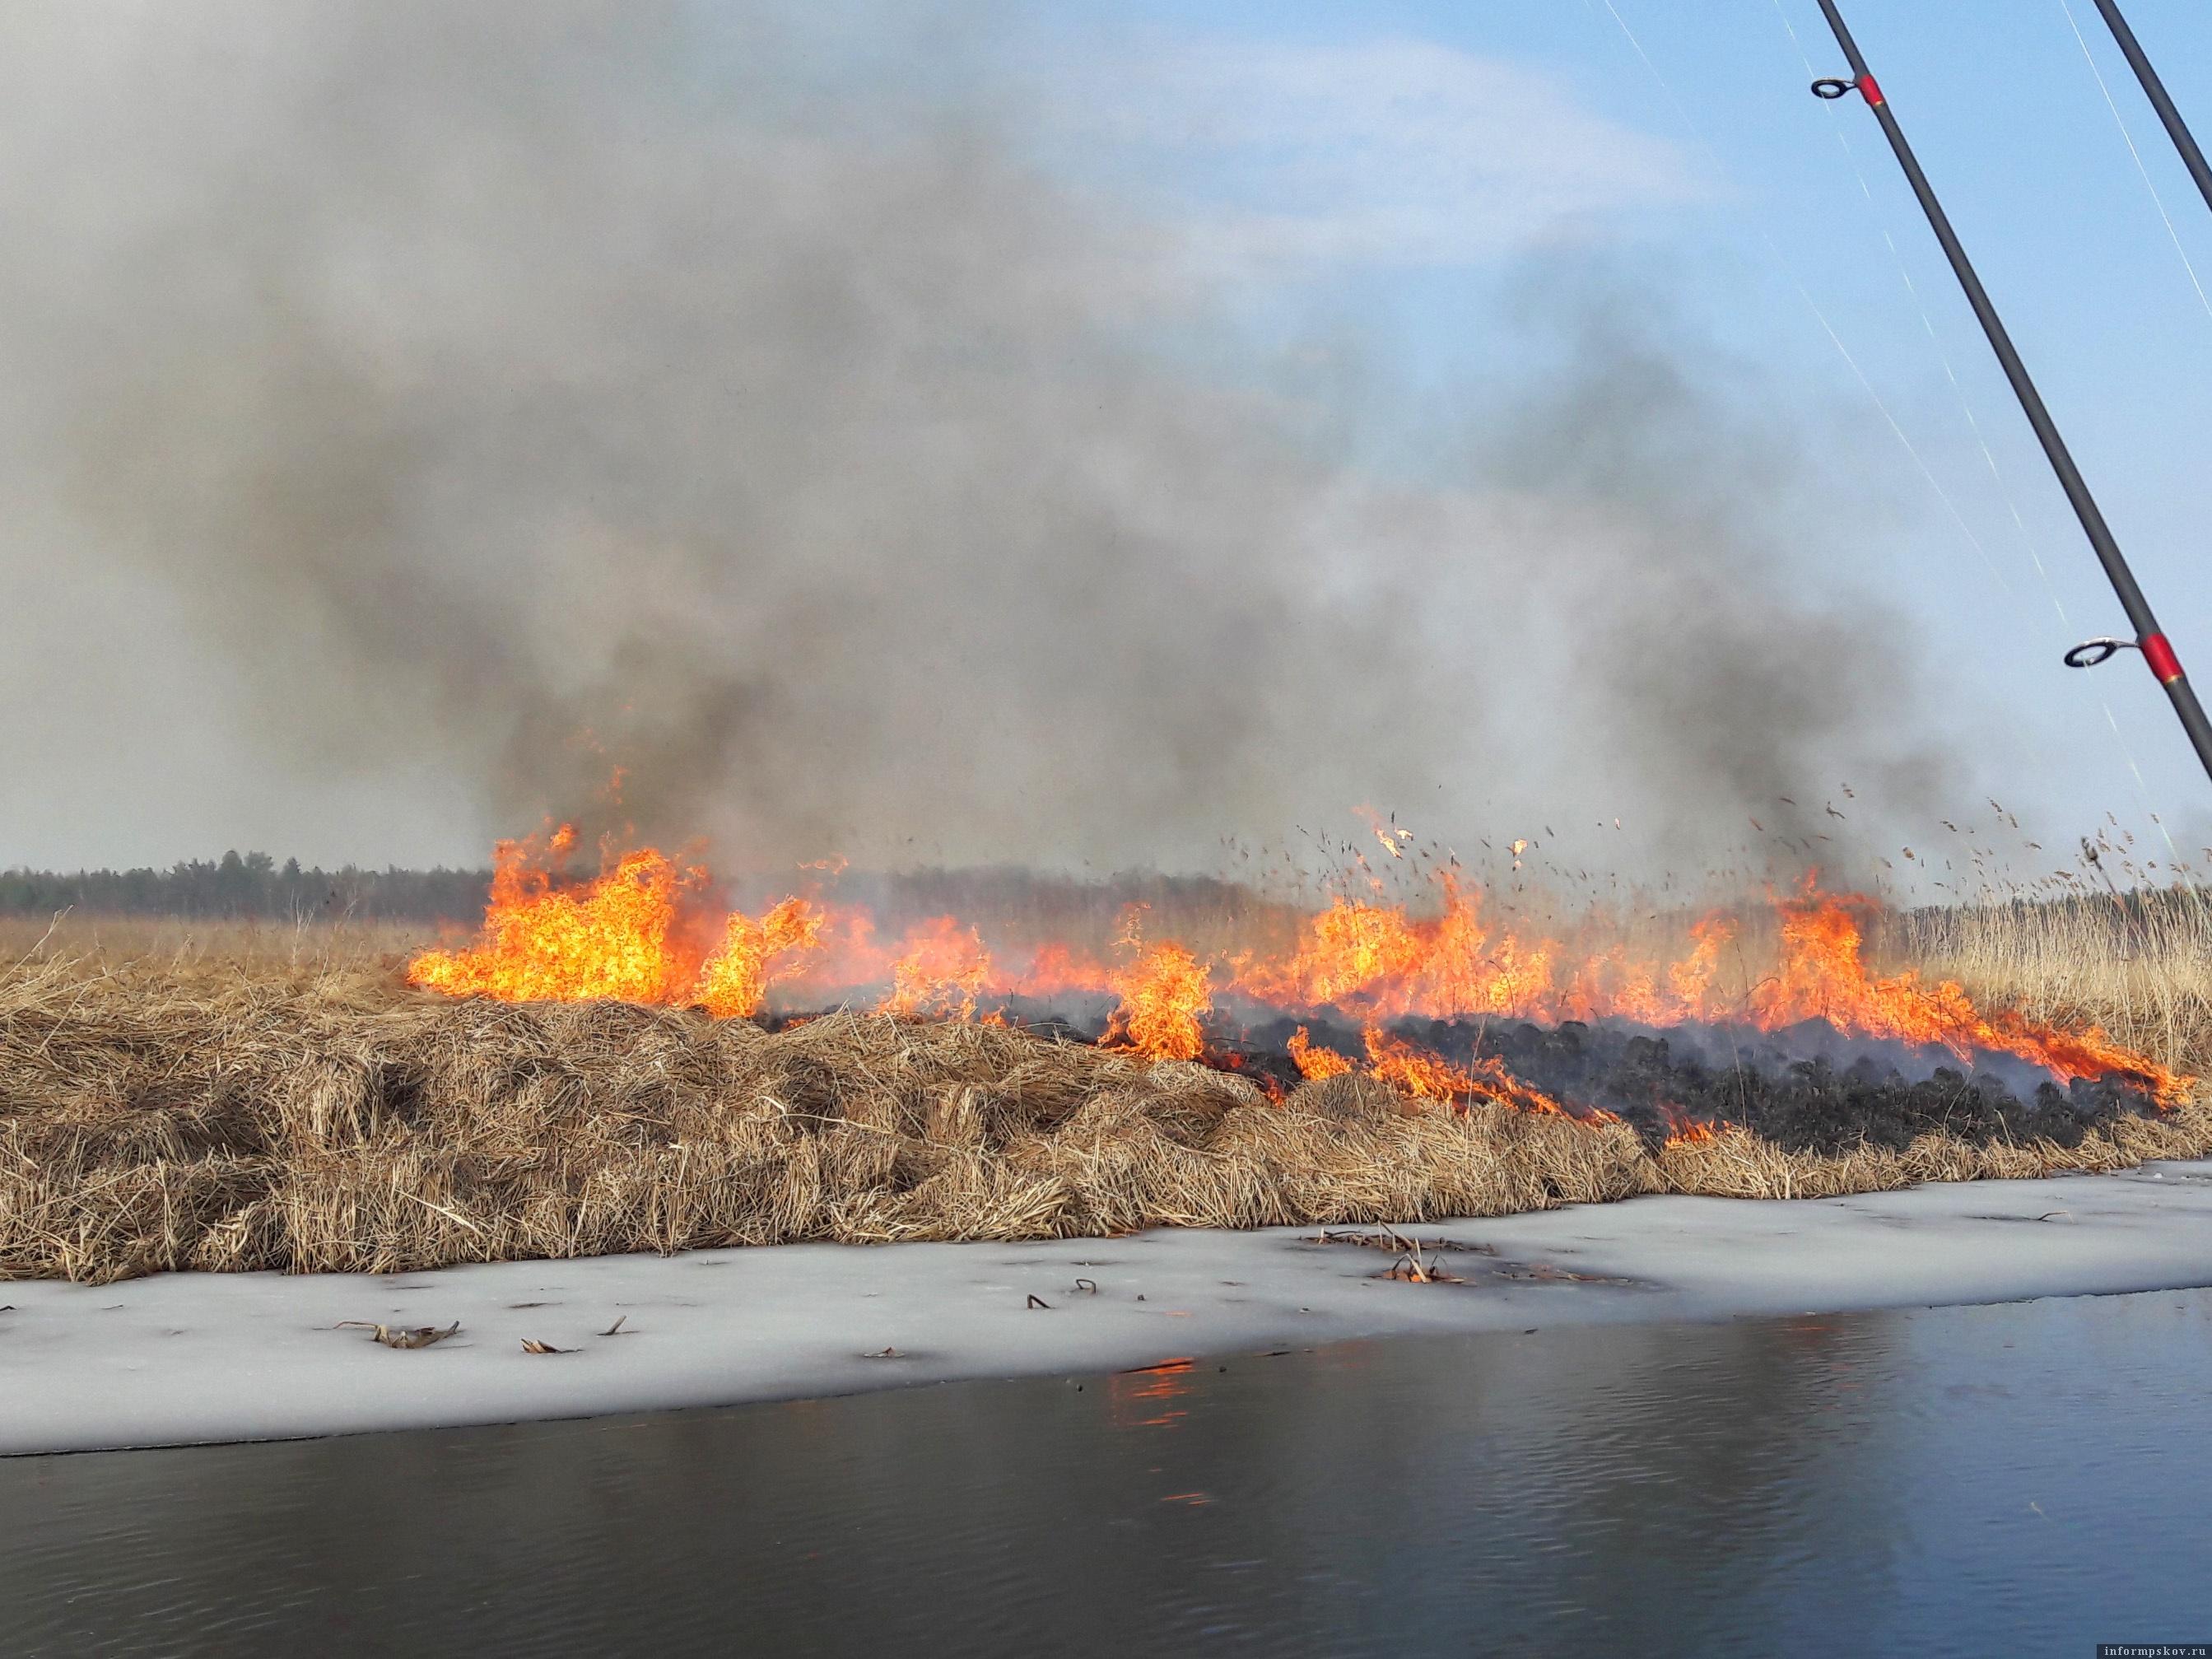 Пожар на берегах реки Желчи 27 марта 2021 года. Фото автора.